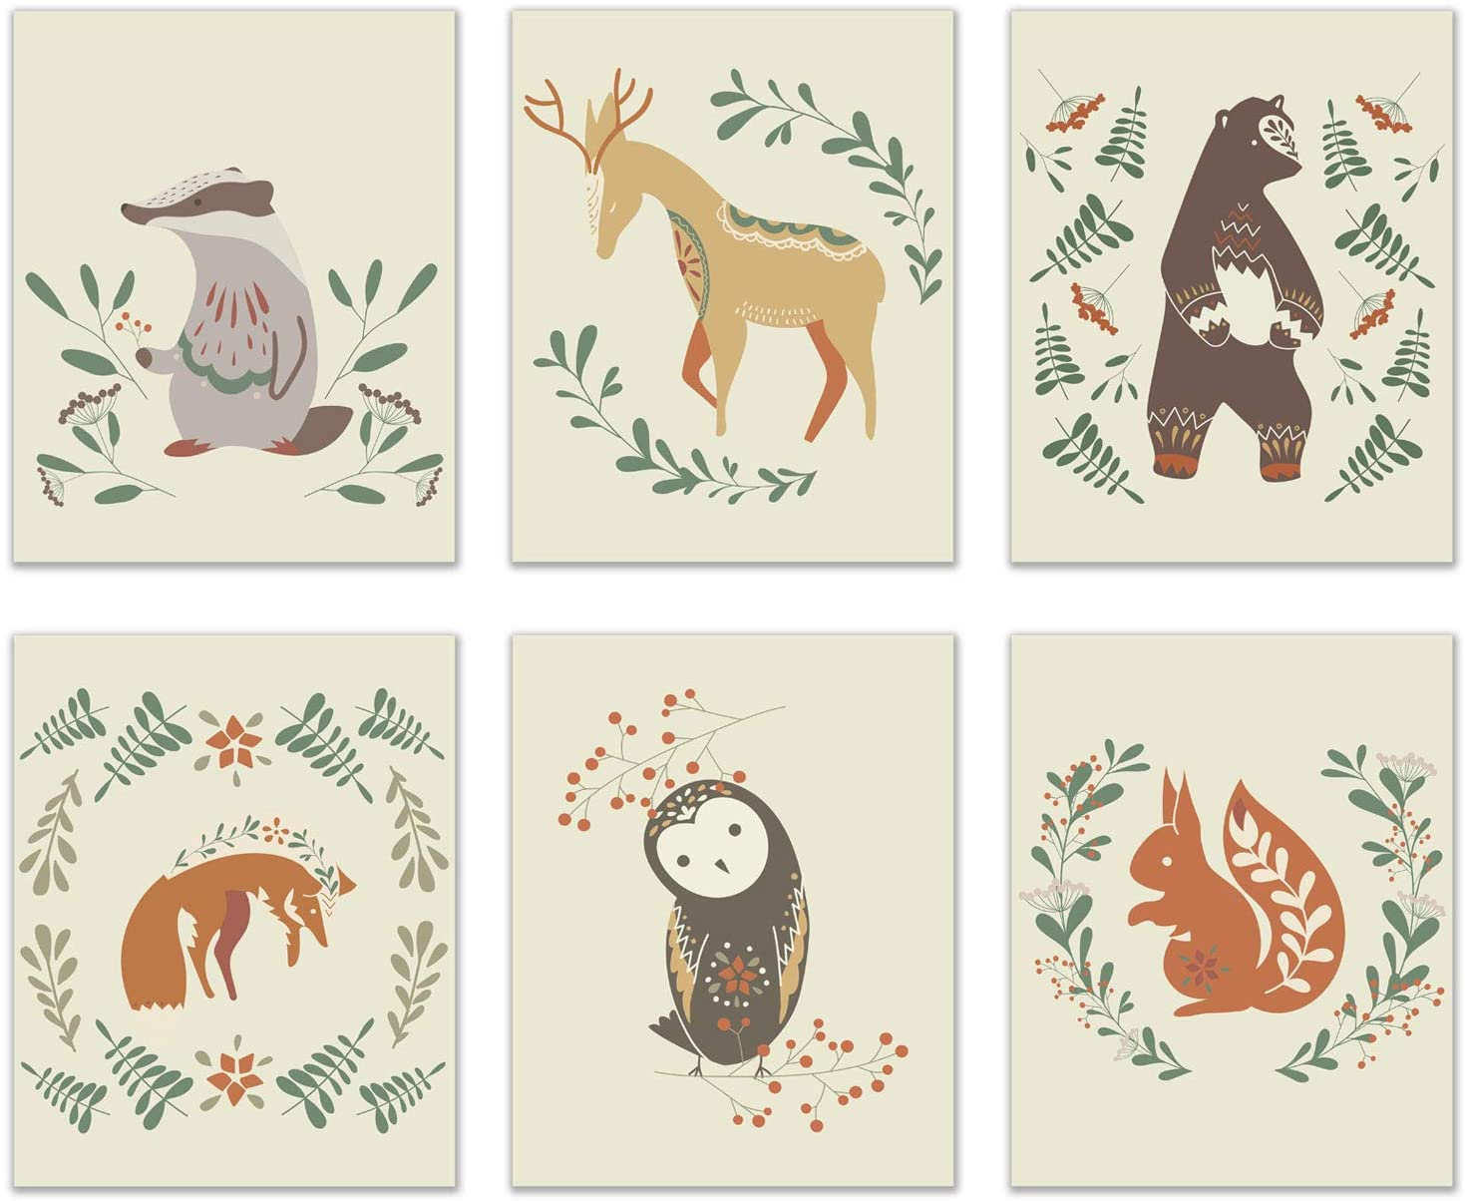 Nordic Woodland Animals Prints - Set of 6 (8x10 Inches) Glossy Modern Scandinavian Nature Nursery Wall Art Decor - Brown Bear - Deer - Badger - Owl - Fox - Squirrel